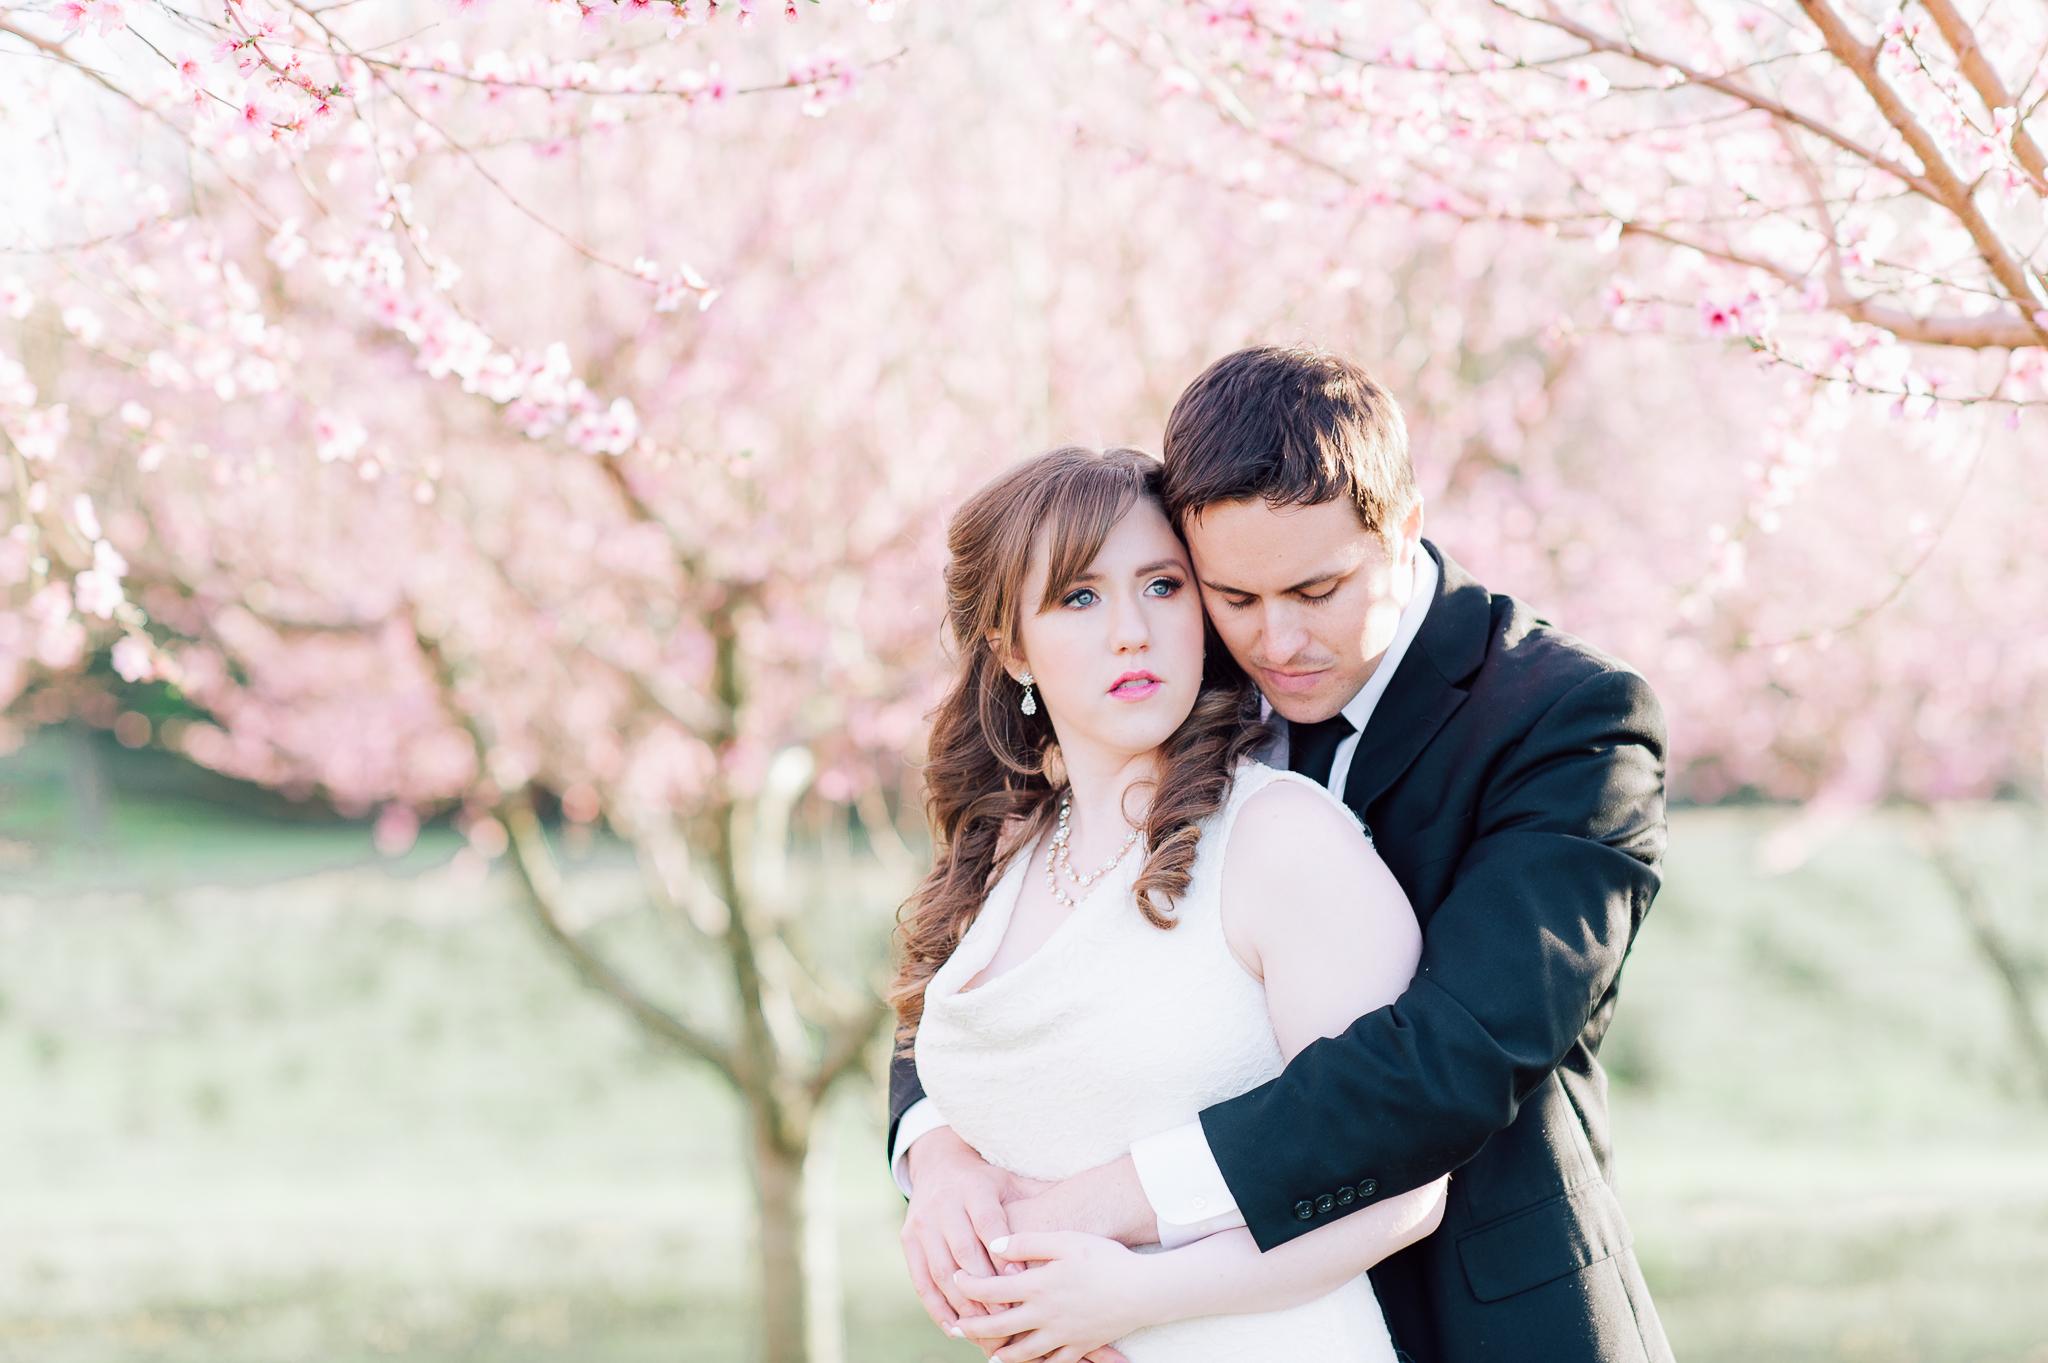 springwedding_cherryblossoms_virginiaphotographer_youseephotography_styledshoot (544).jpg